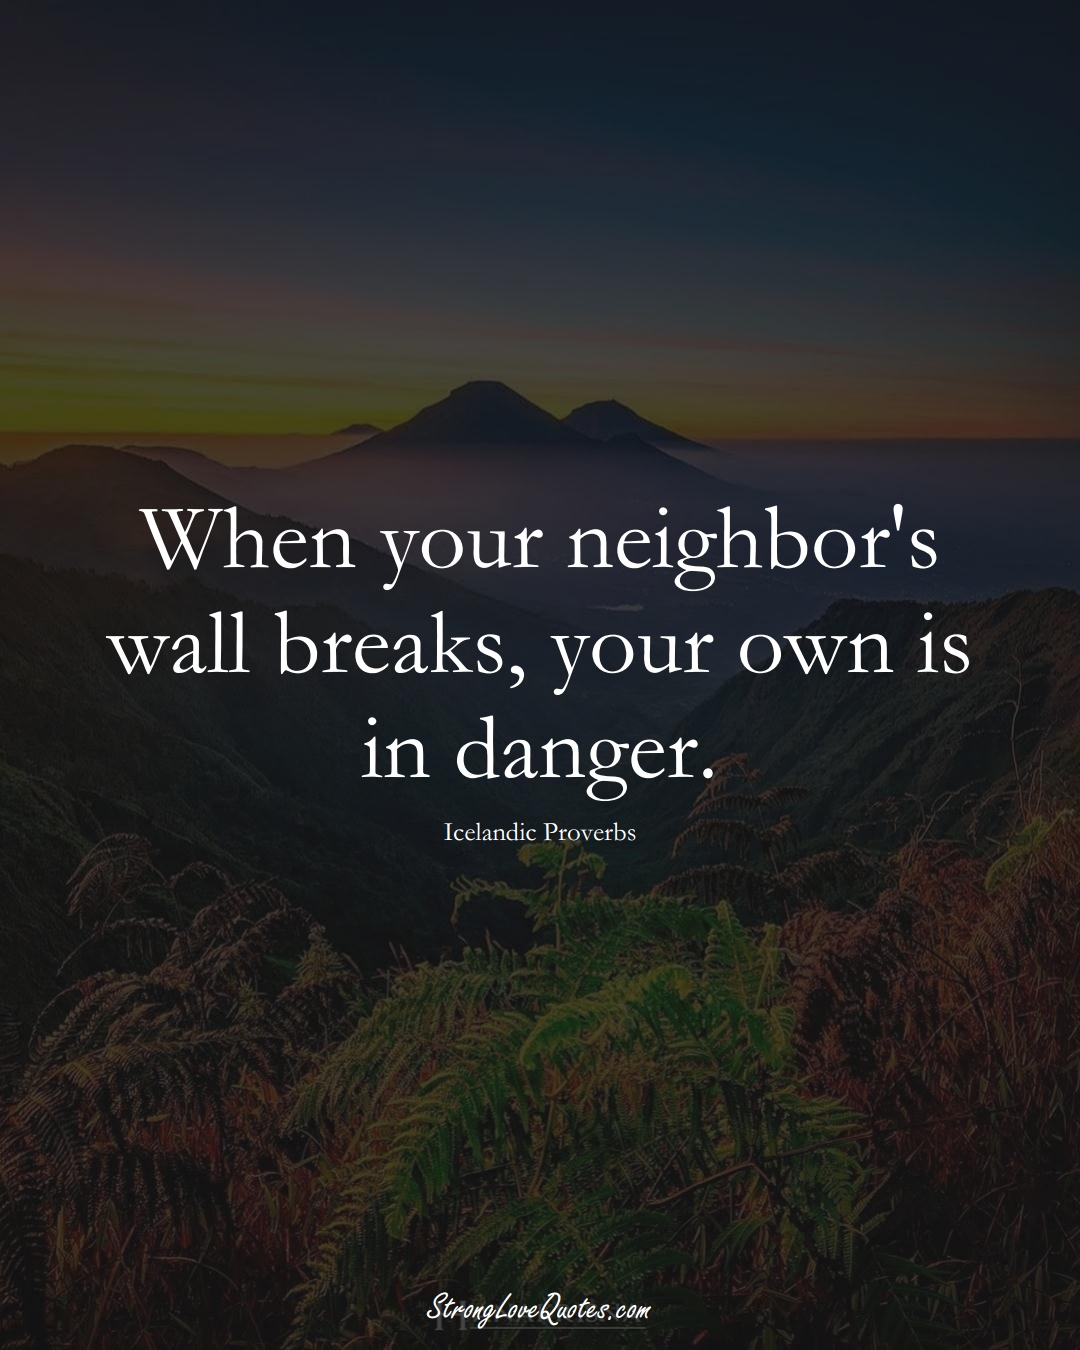 When your neighbor's wall breaks, your own is in danger. (Icelandic Sayings);  #EuropeanSayings